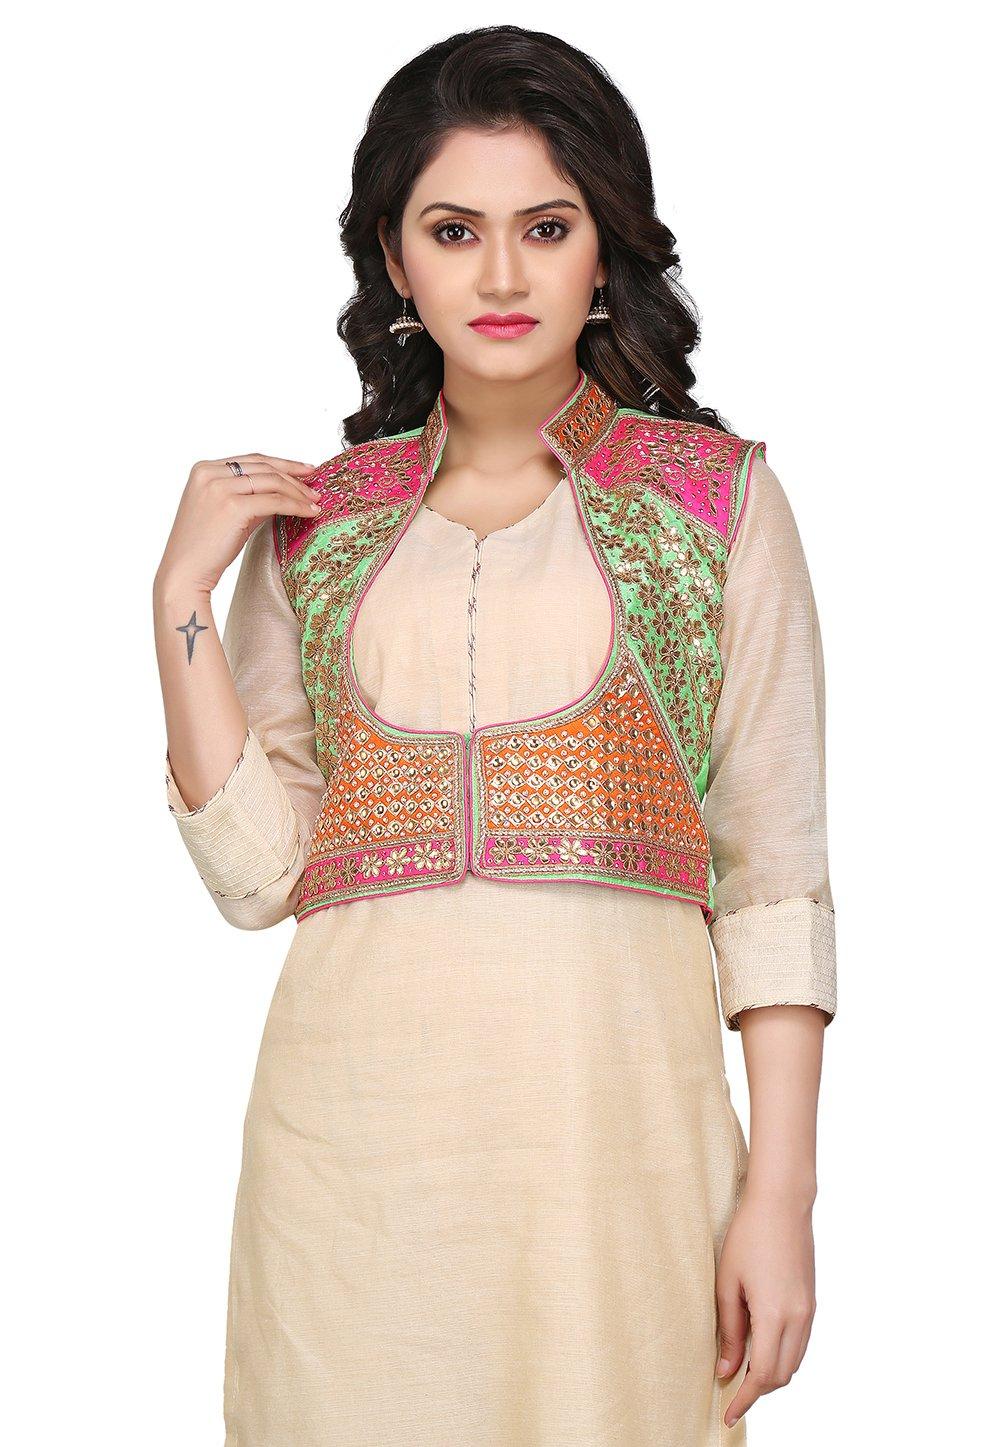 Utsav Fashion Gota Patti Embroidered Dupion Silk Jacket in Multi color by Utsav Fashion